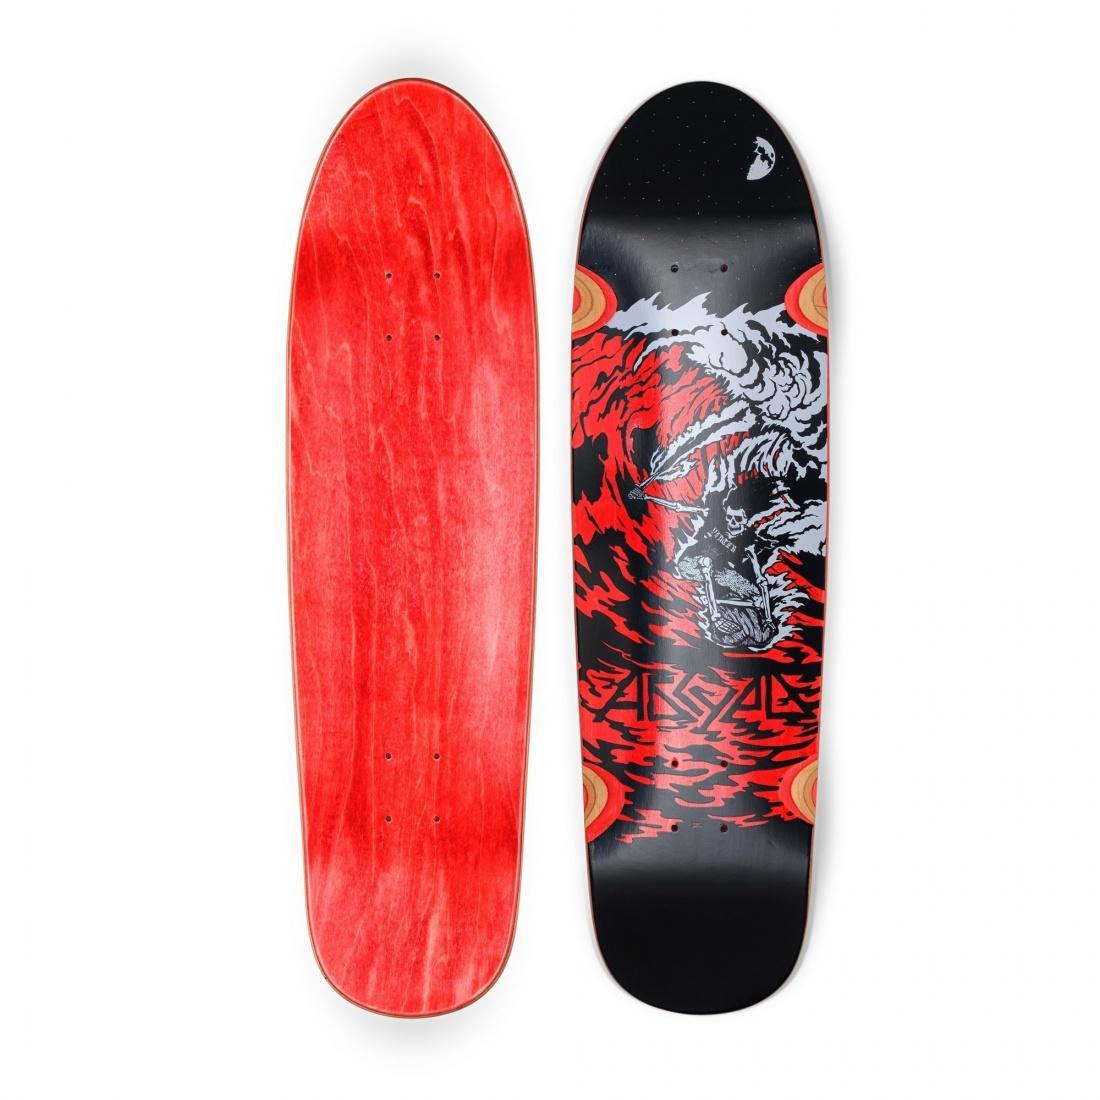 Дека для скейтборда Абсурд Волны крови